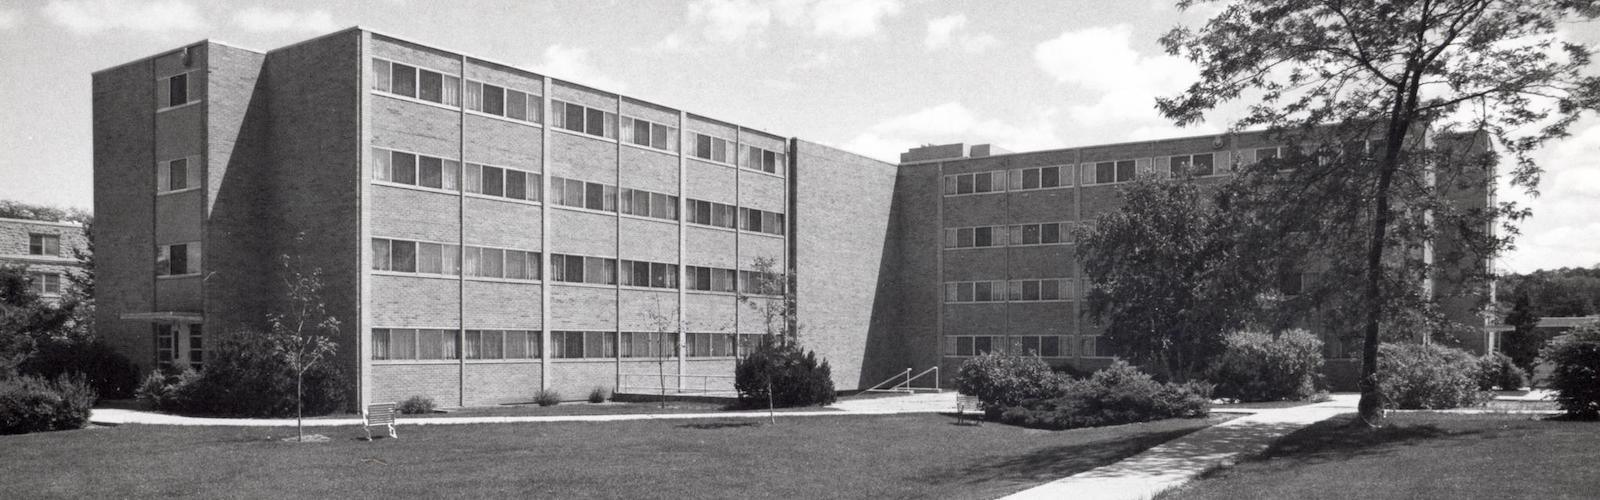 Bradley Hall exterior in 1975